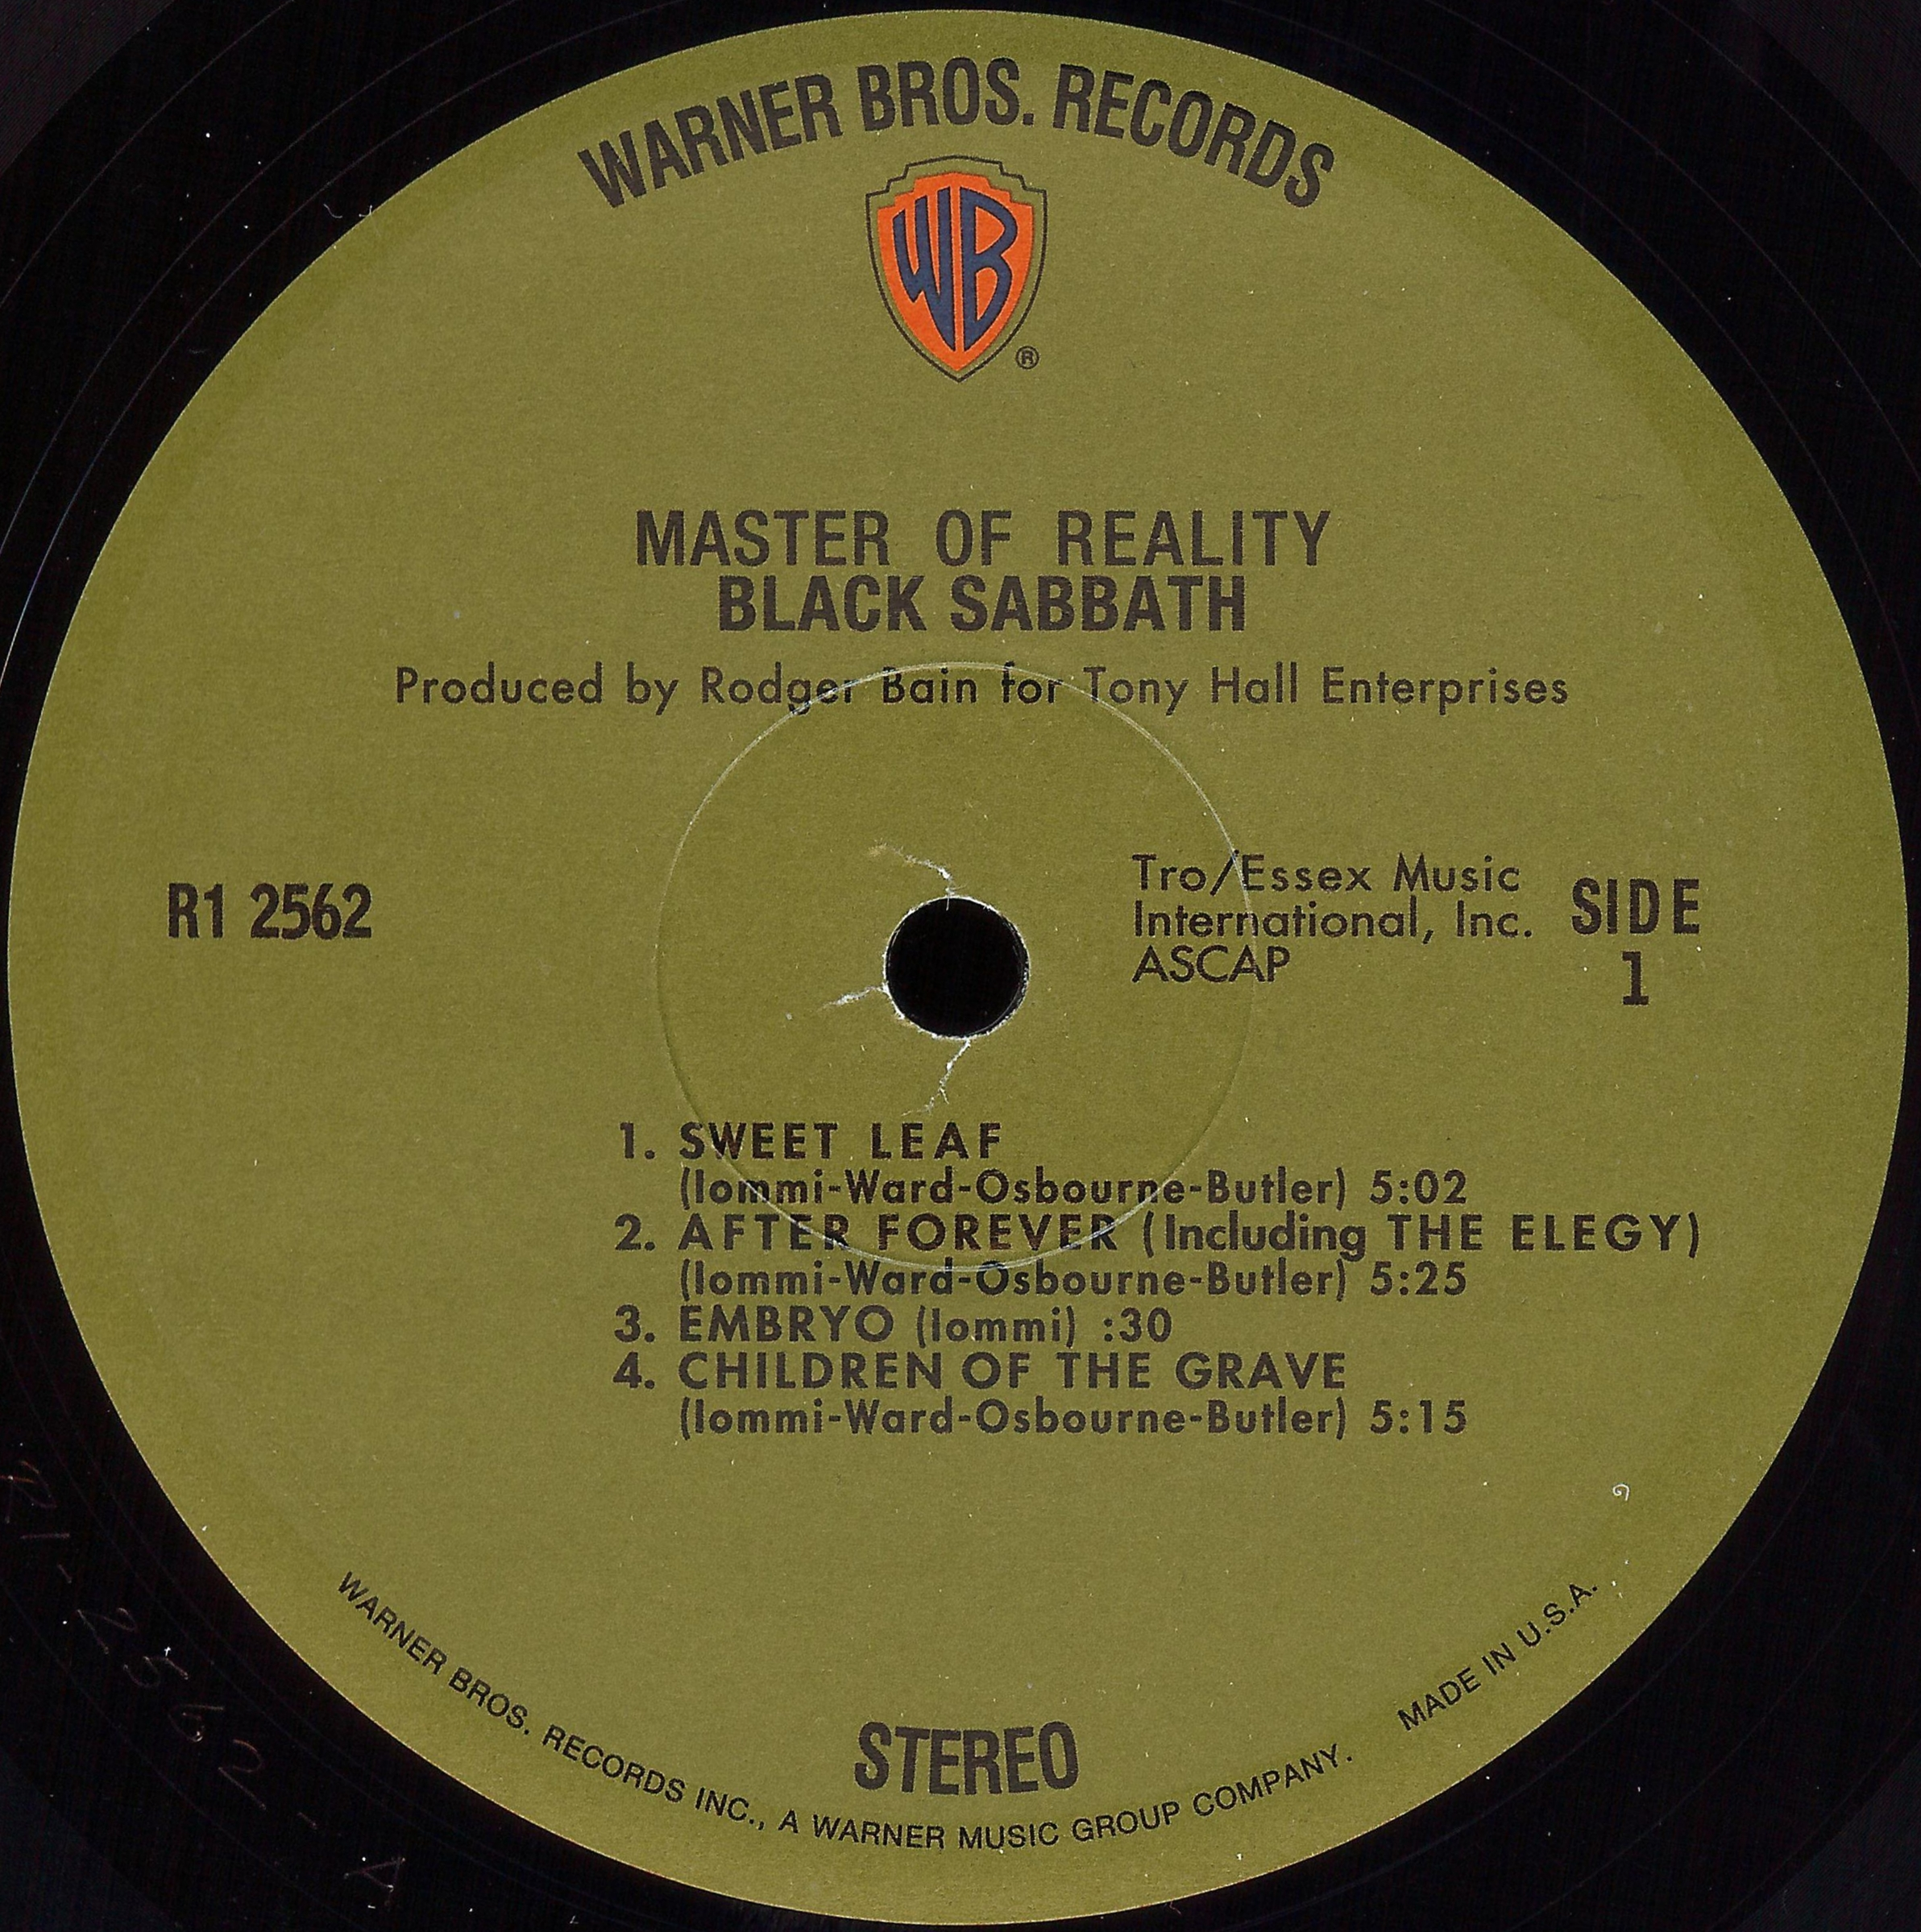 Black Sabbath 171 Dazzrecords